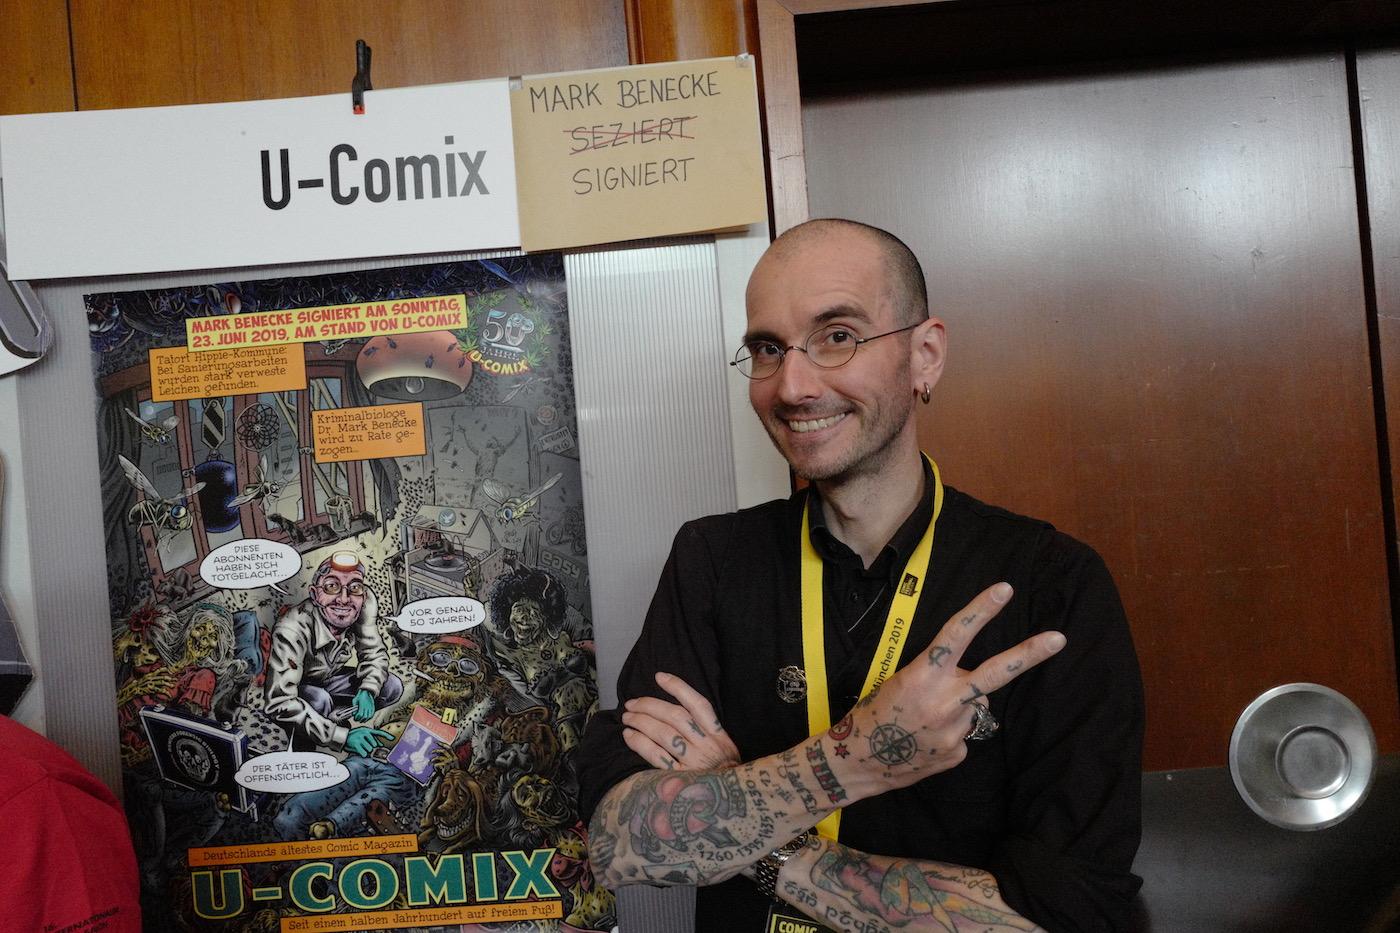 mark_benecke_comic_festival_muenchen_munich_comic_con_2019 - 57.jpg